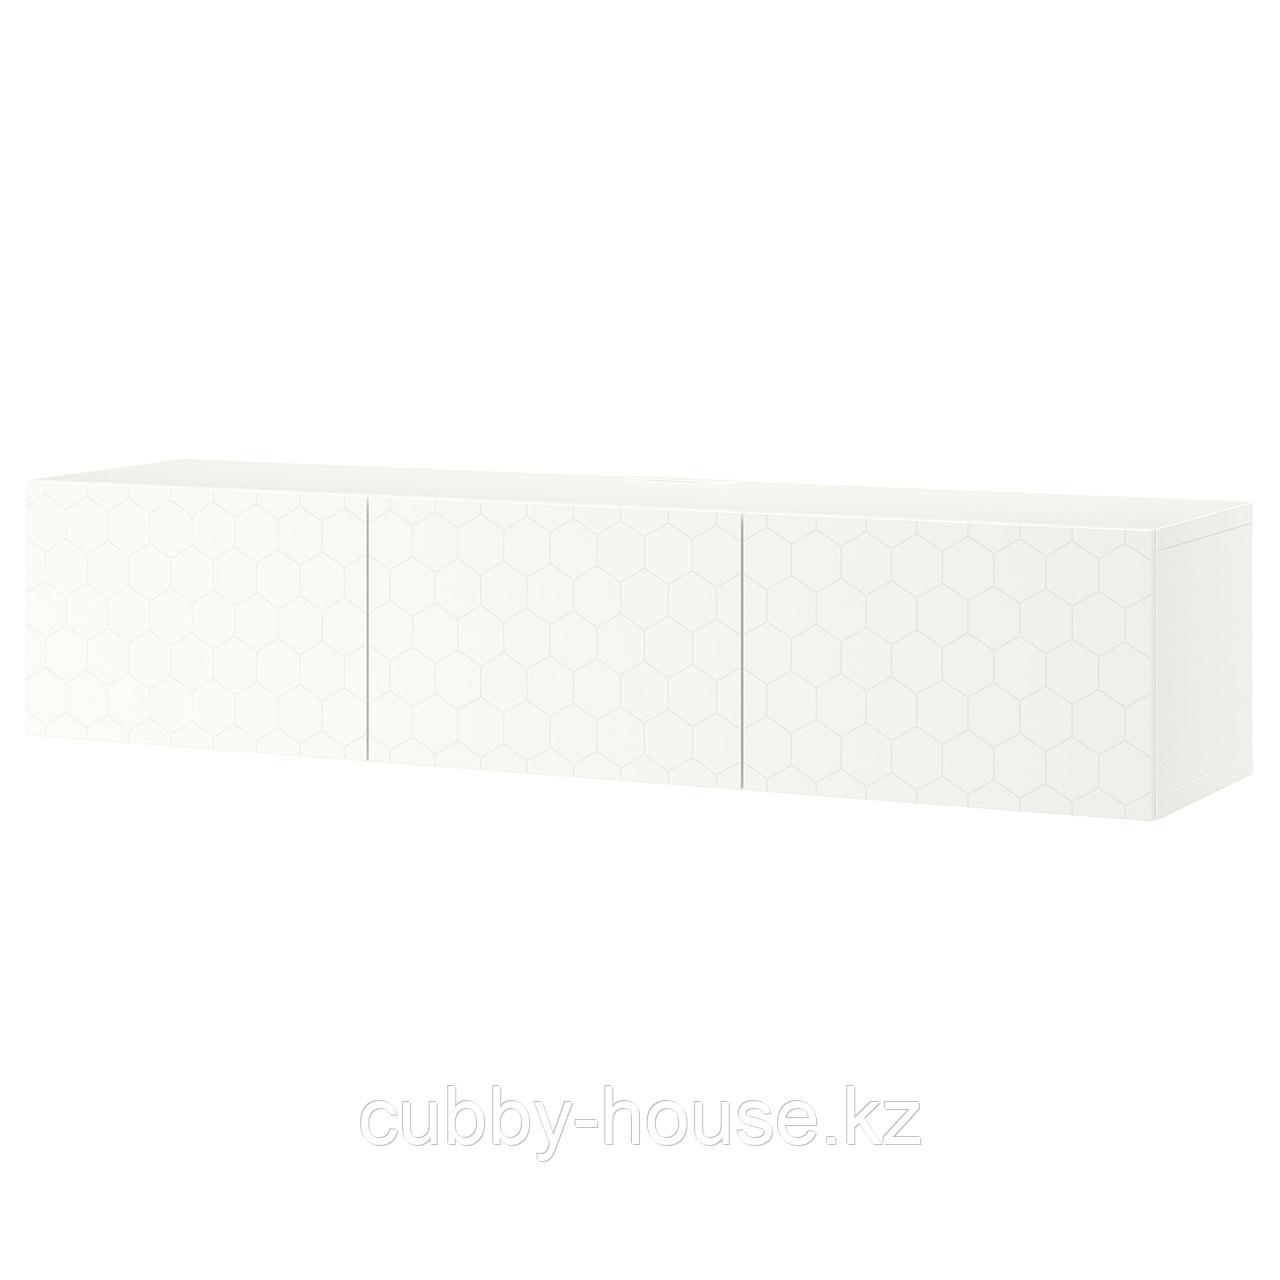 БЕСТО Тумба под ТВ, с дверцами, белый, Лаппвикен белый, 180x42x38 см